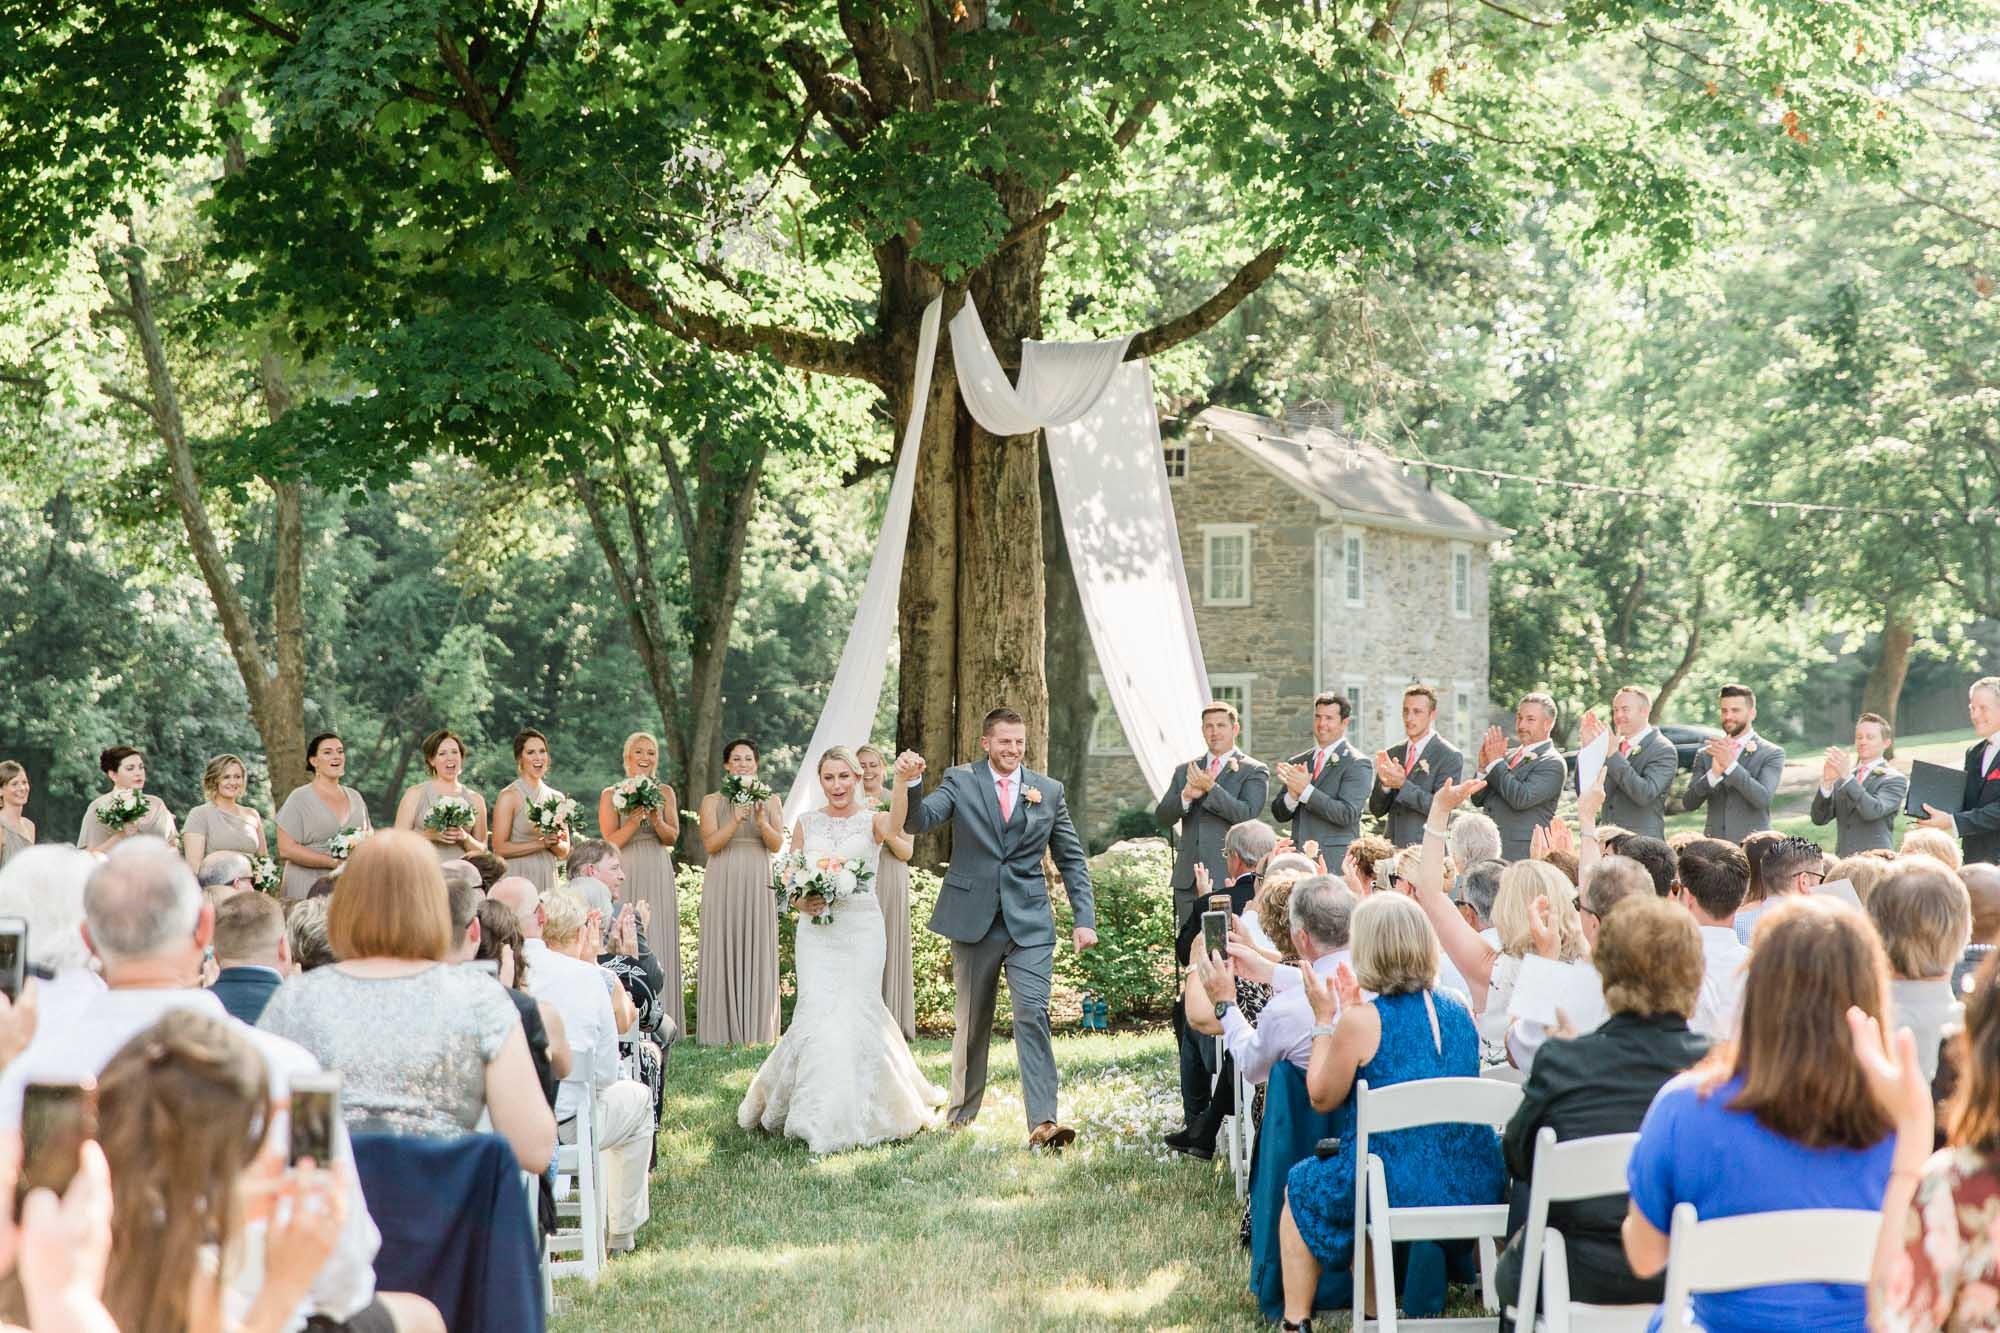 Allenberry-resort-historic-pennsylvania-wedding-19932.jpg